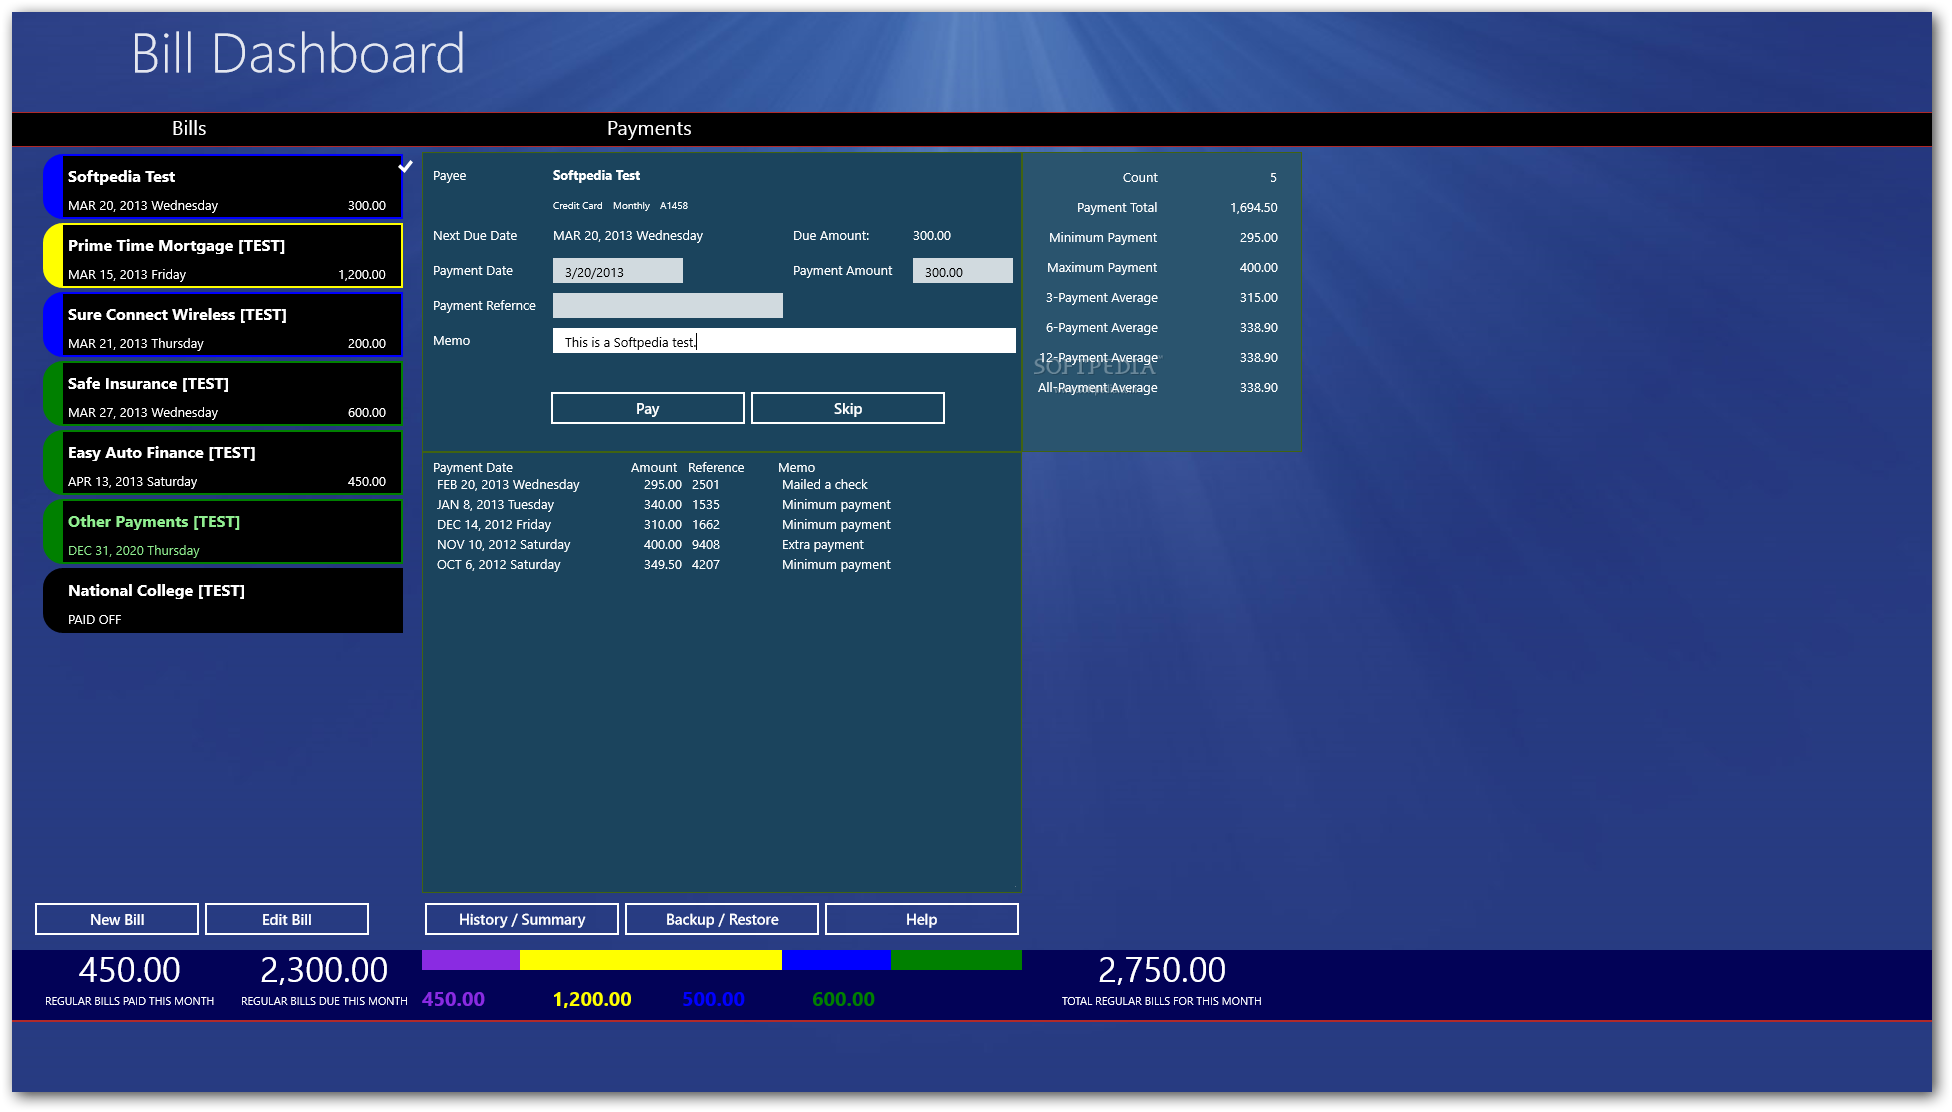 Download Bill Dashboard For Windows 10 8 1 1 2 0 0